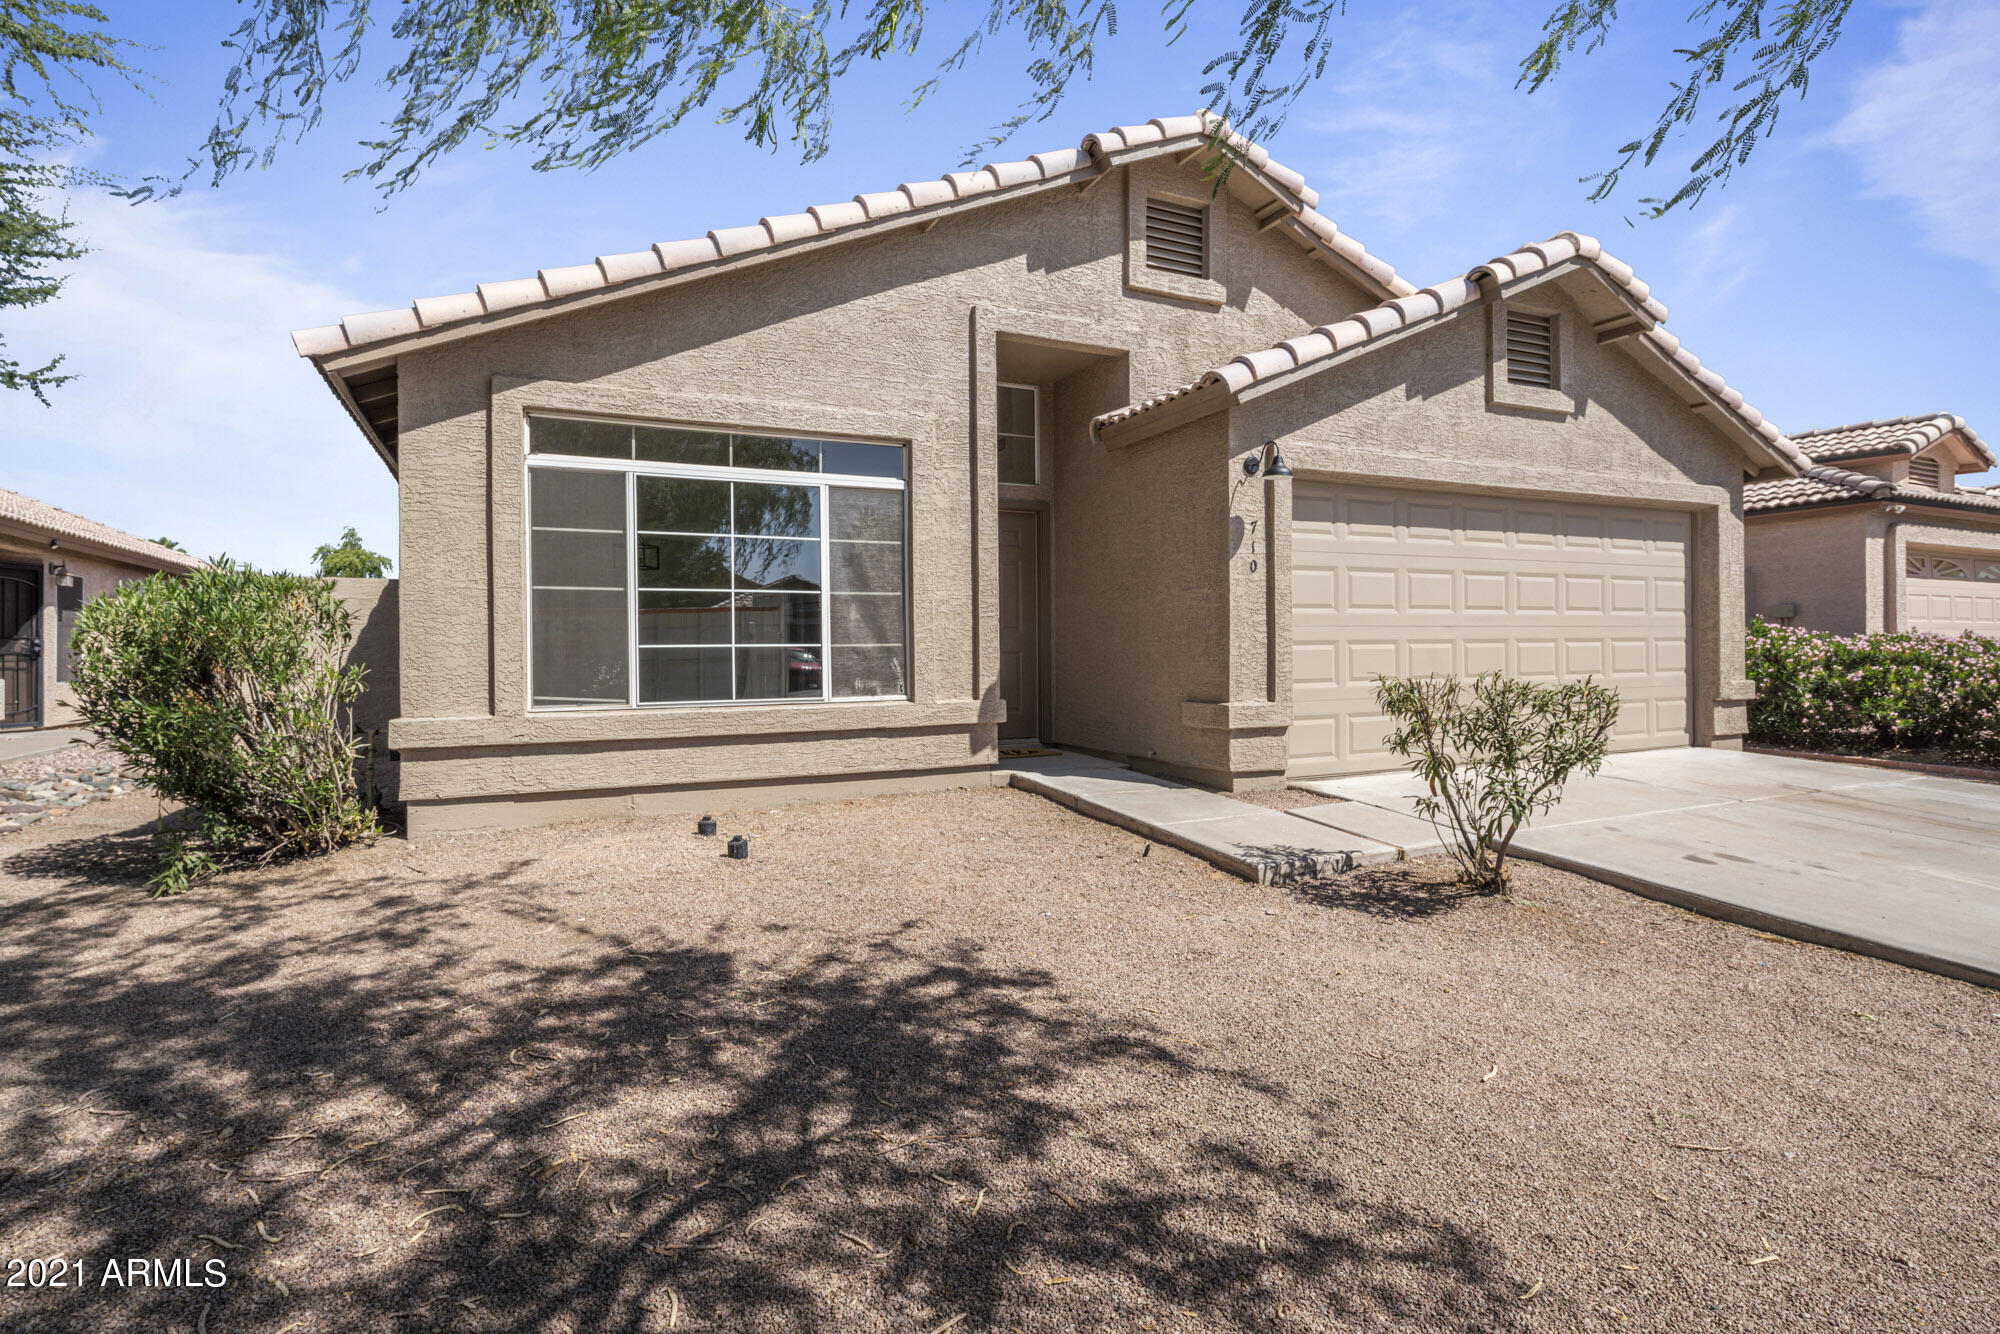 710 W ORANGE Drive, Gilbert, AZ 85233, 3 Bedrooms Bedrooms, ,Residential,For Sale,710 W ORANGE Drive,6297807